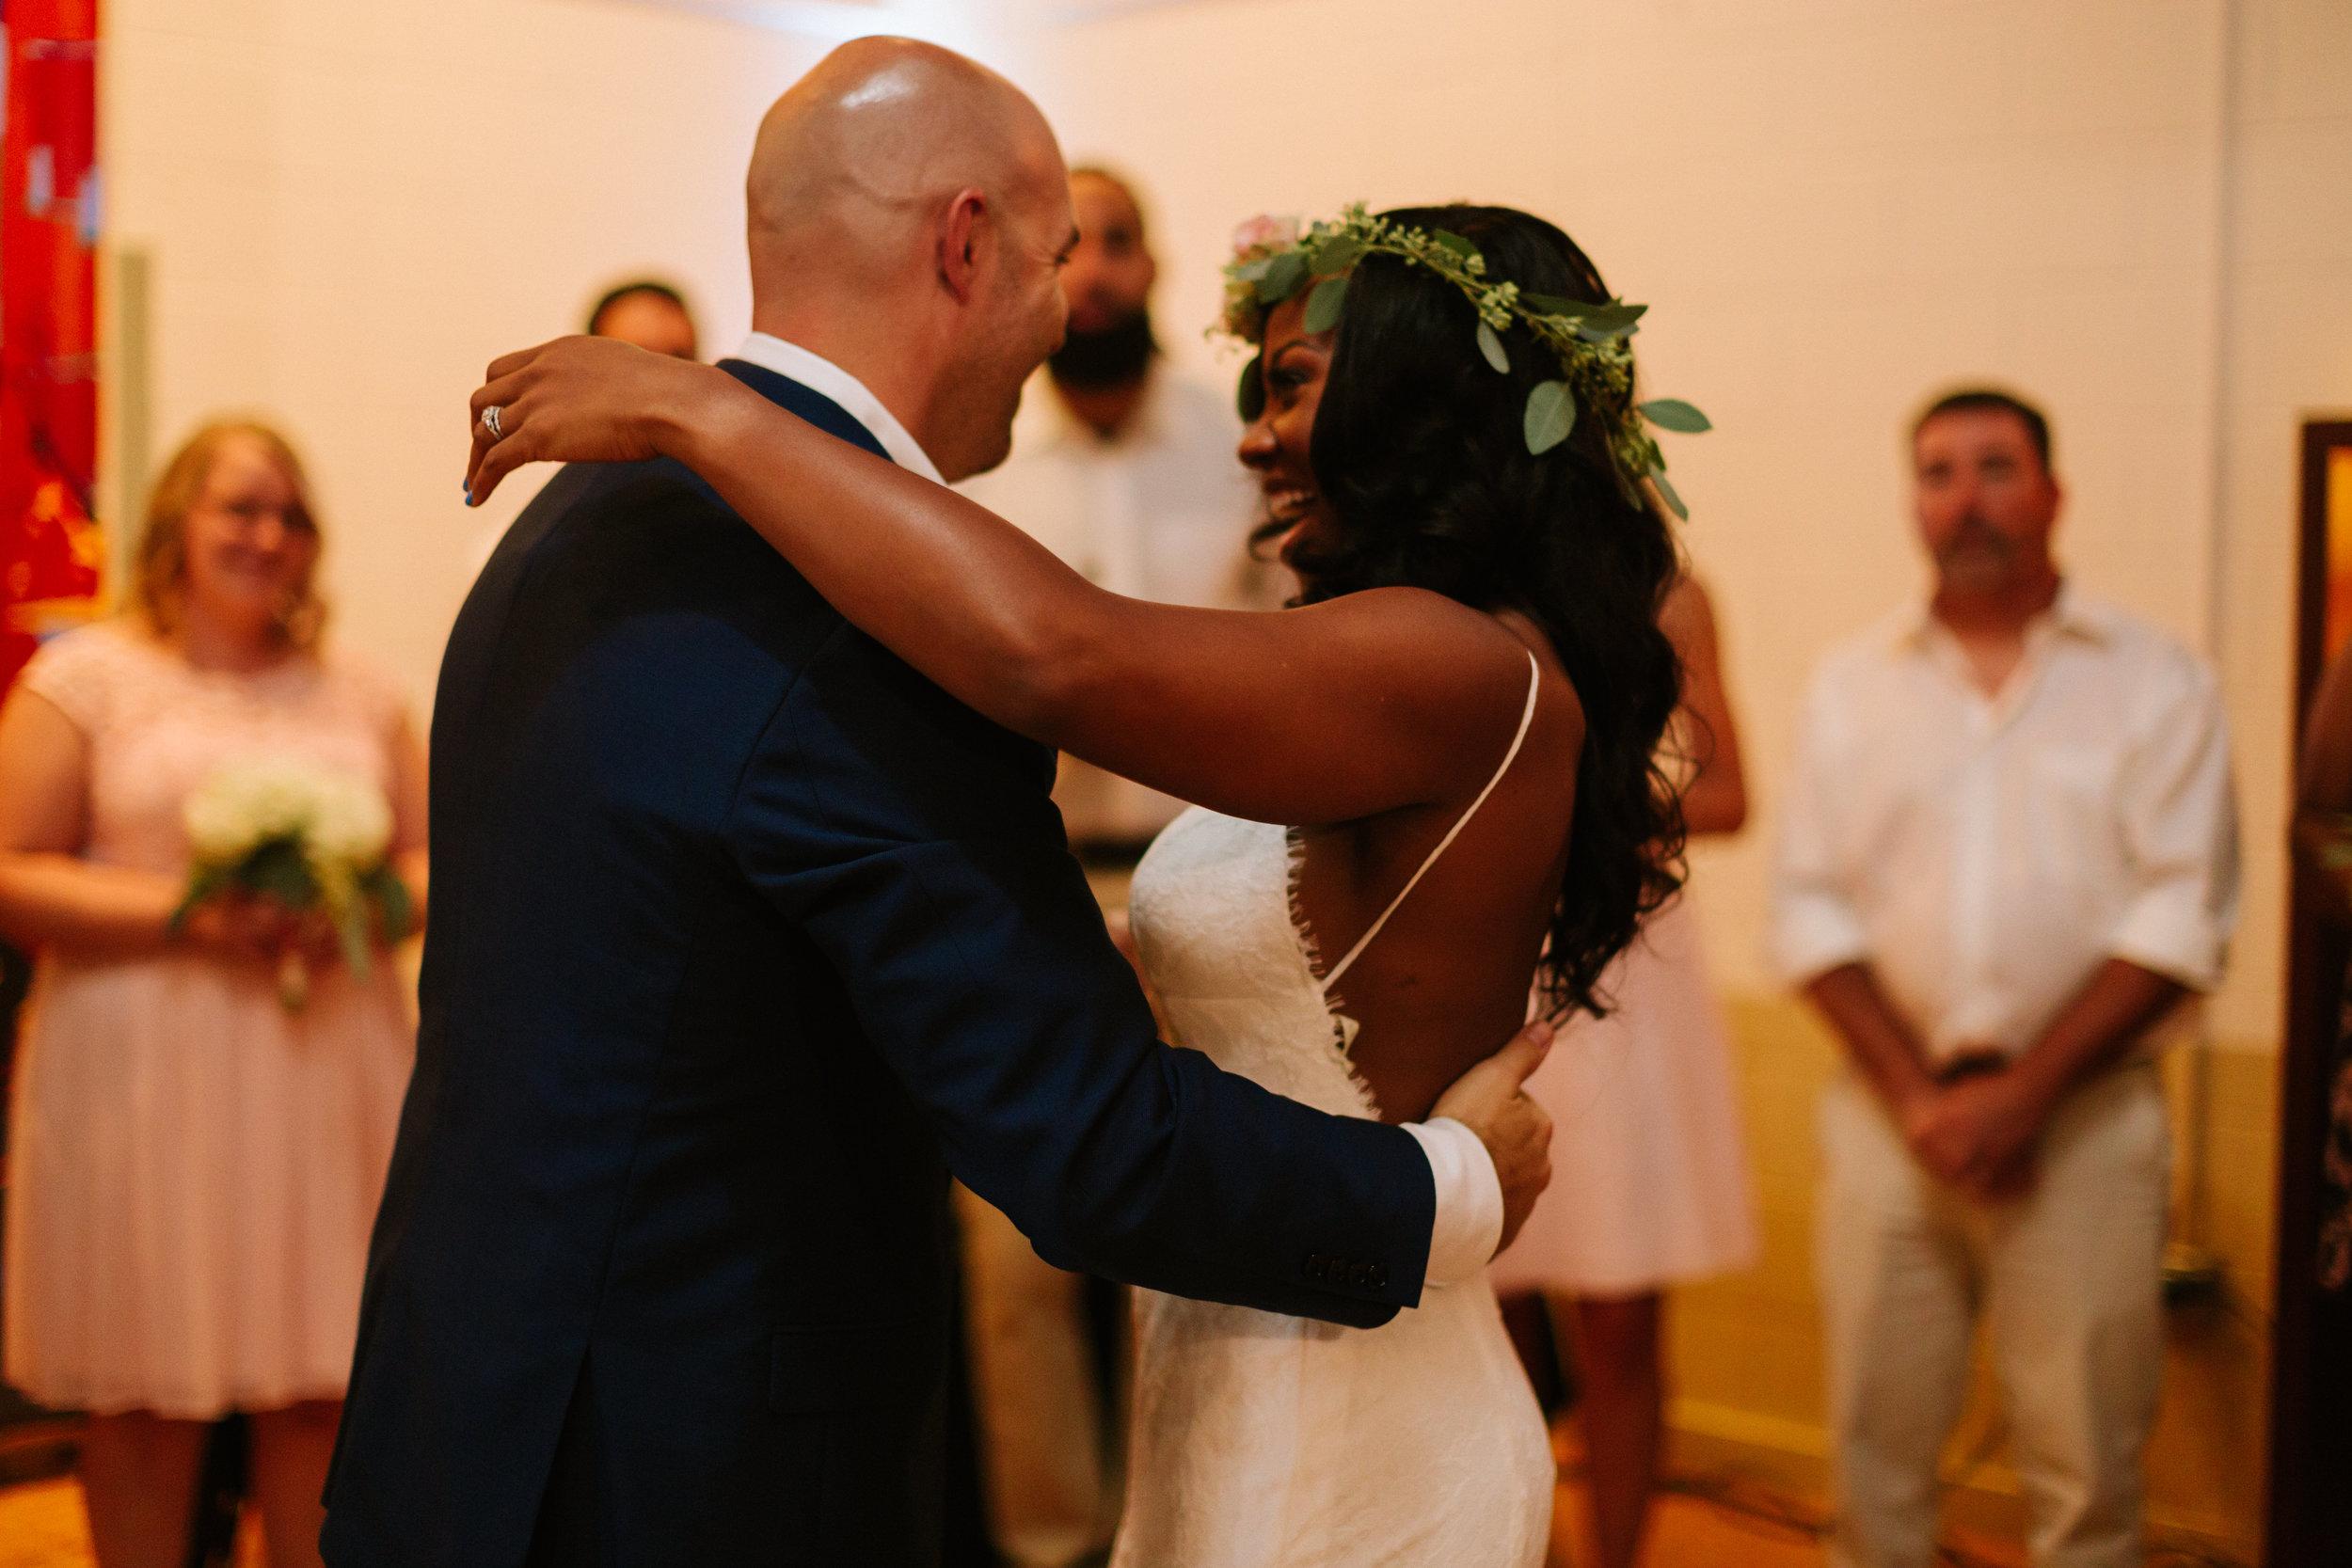 2017.09.16 Ashley and Chuck O'Day Quantam Leap Winery Wedding (310 of 462).jpg